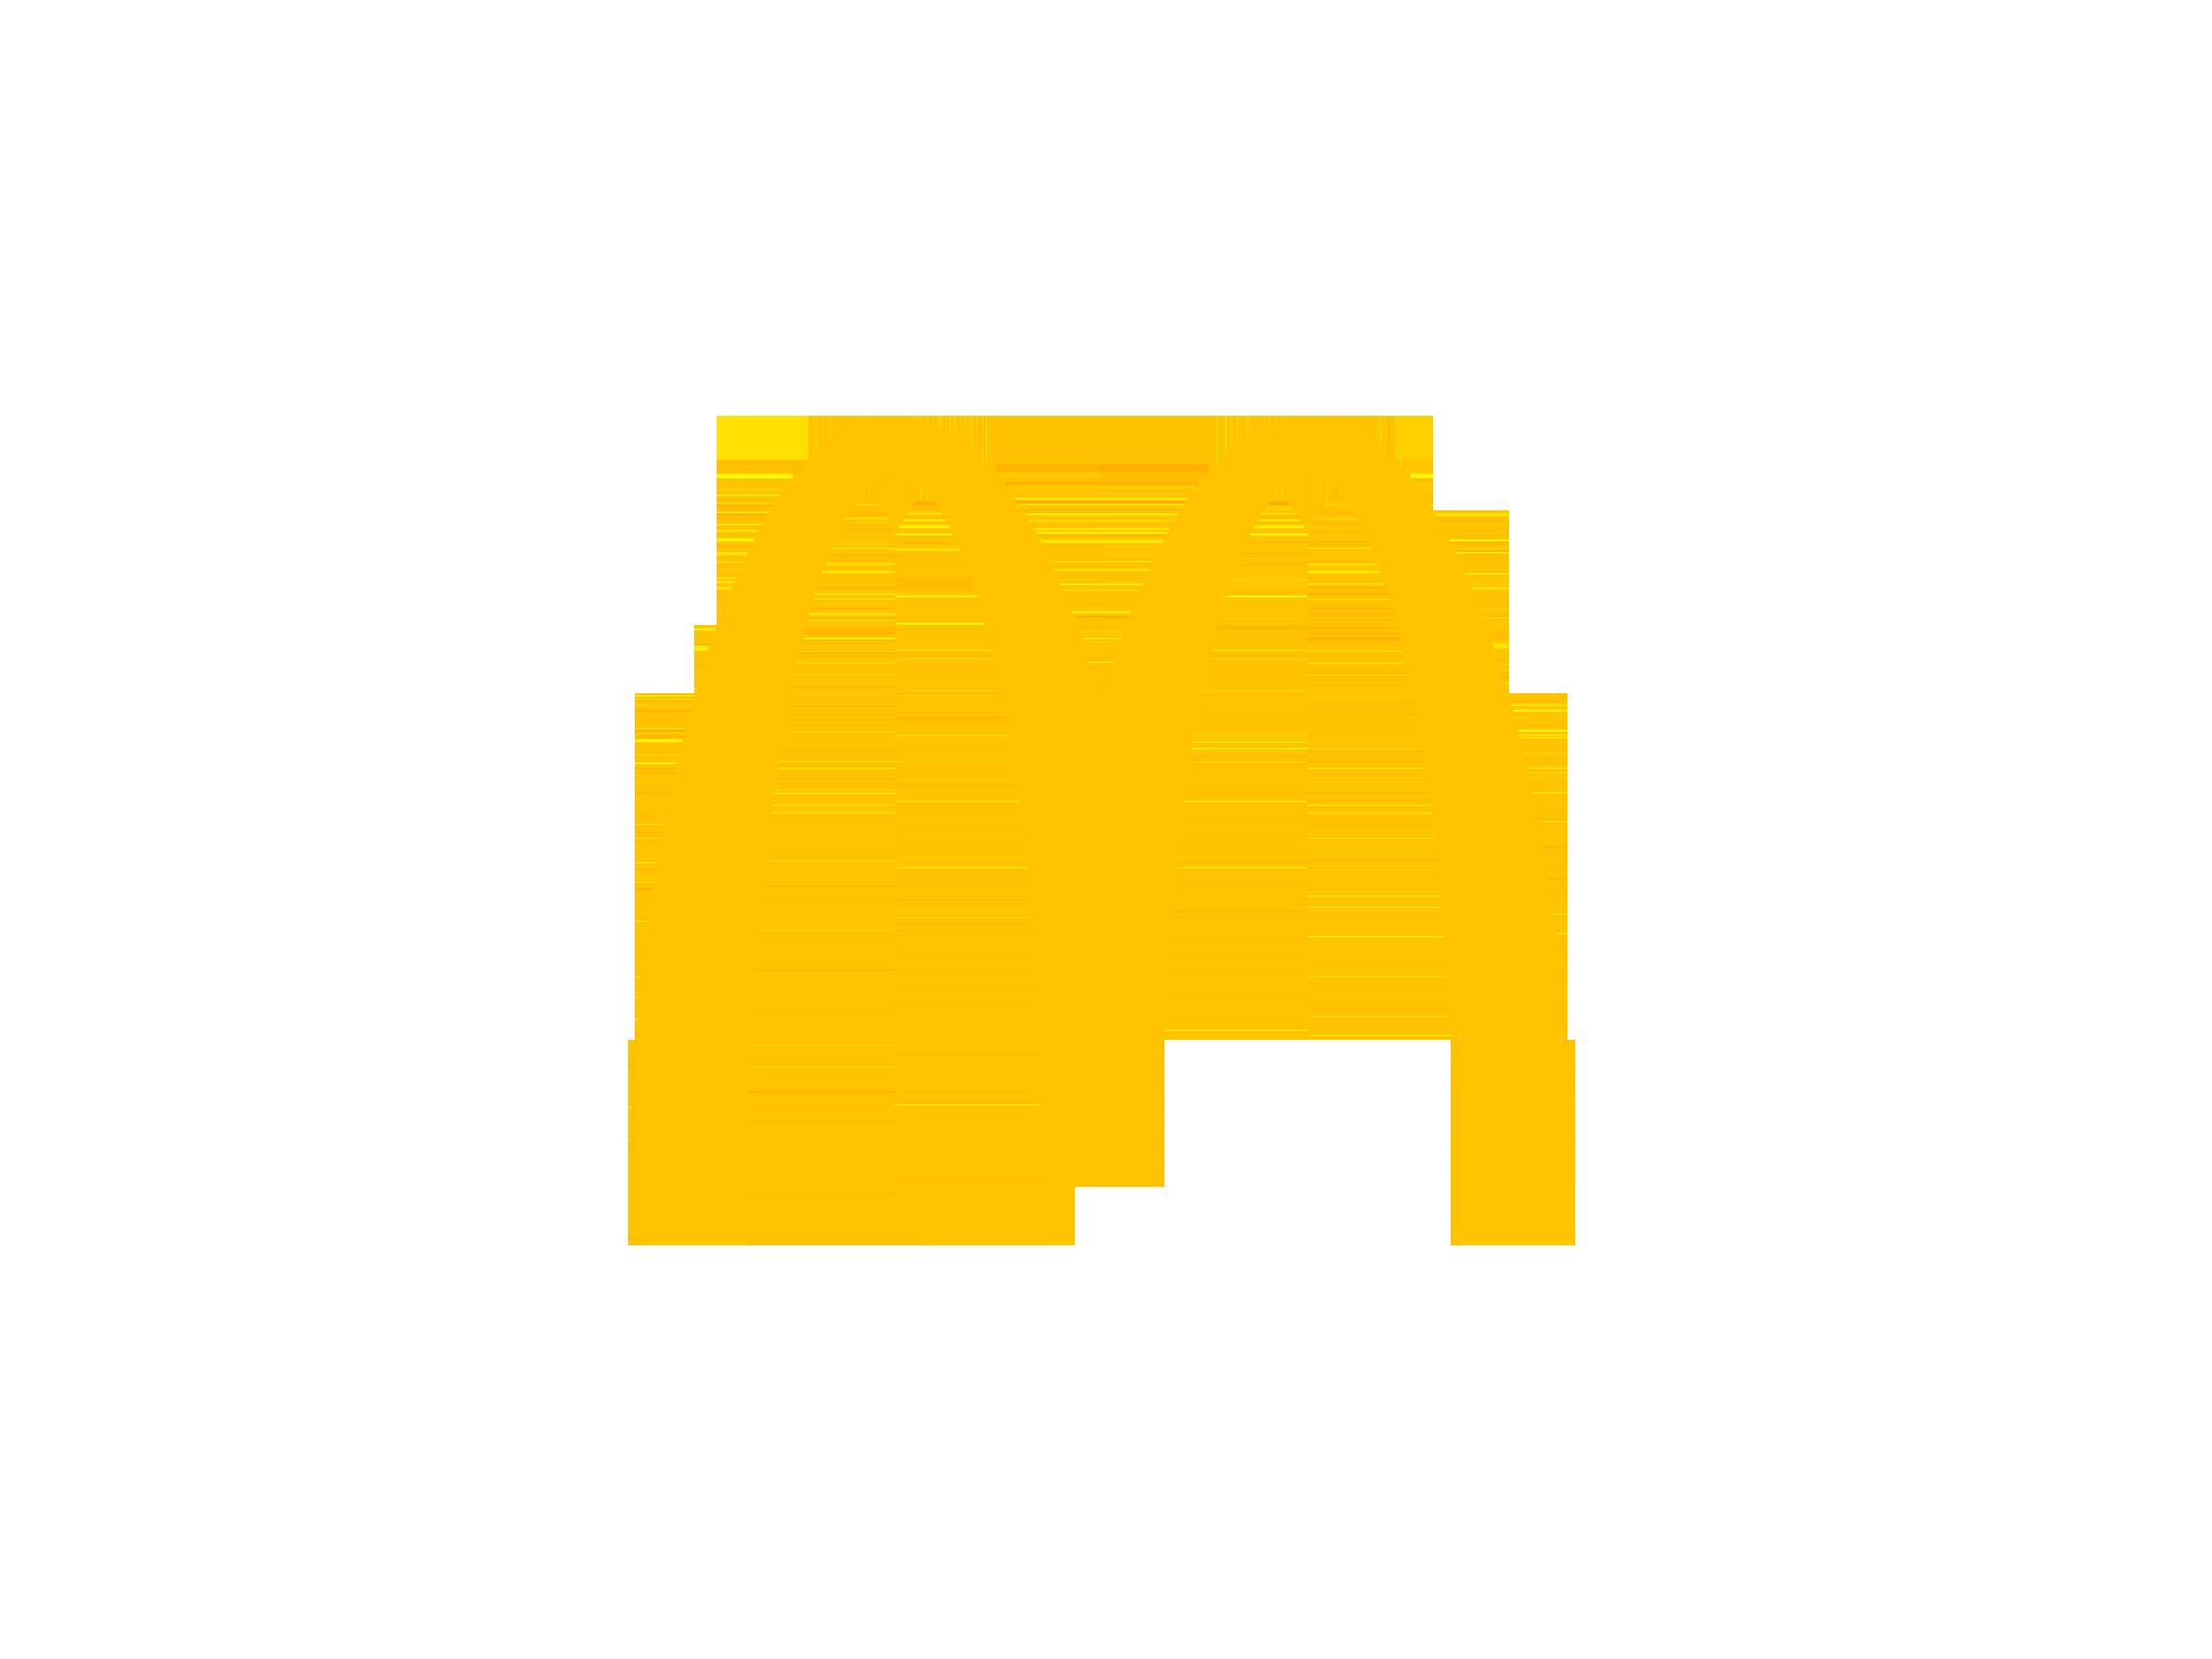 McDonald's logo PNG images Download